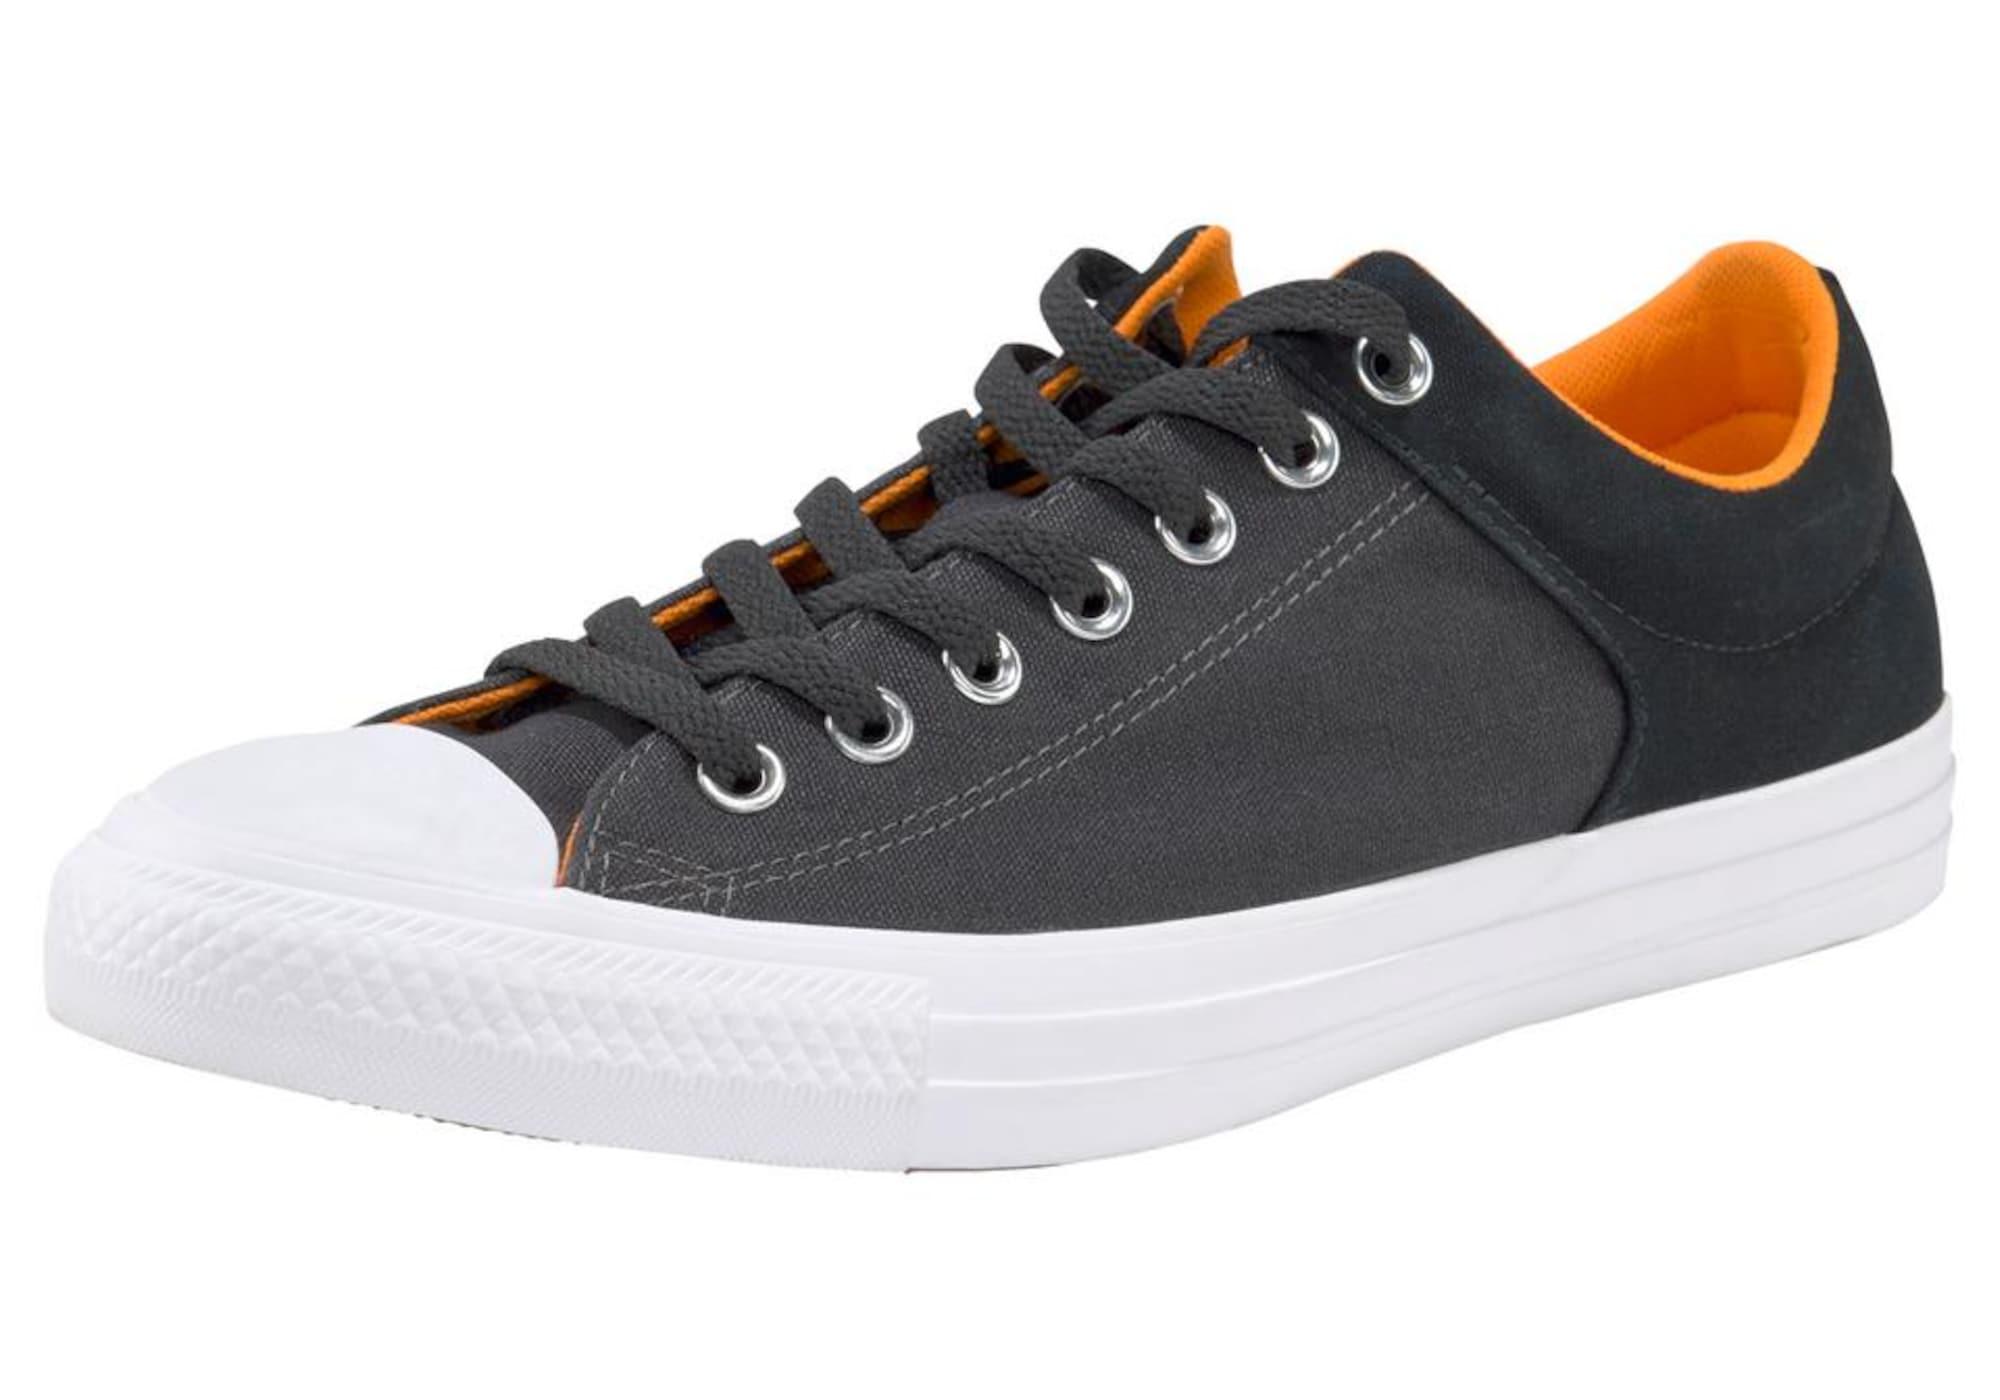 Sneaker 'All Star High Street Ox' | Schuhe > Sneaker > Sneaker high | Orange - Schwarz - Weiß | Converse